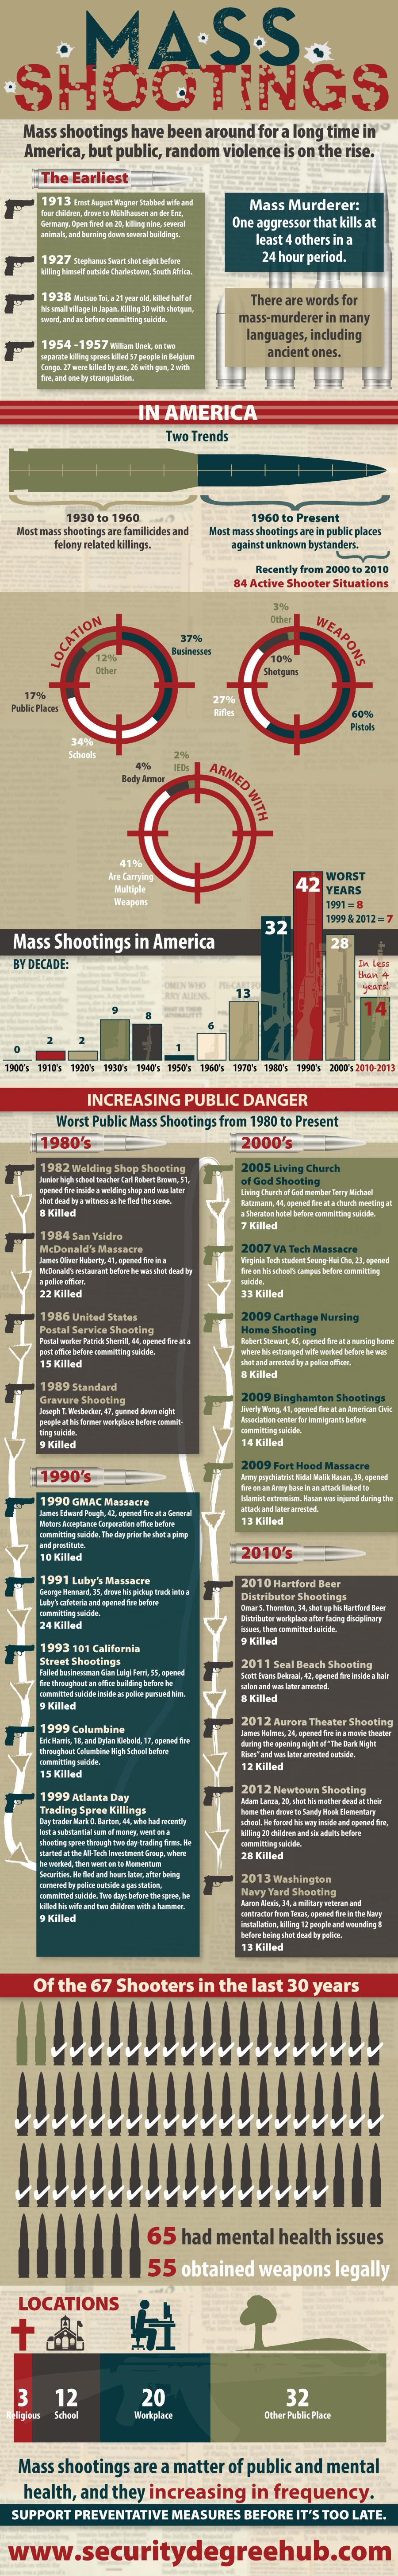 Infographic Mass shootings